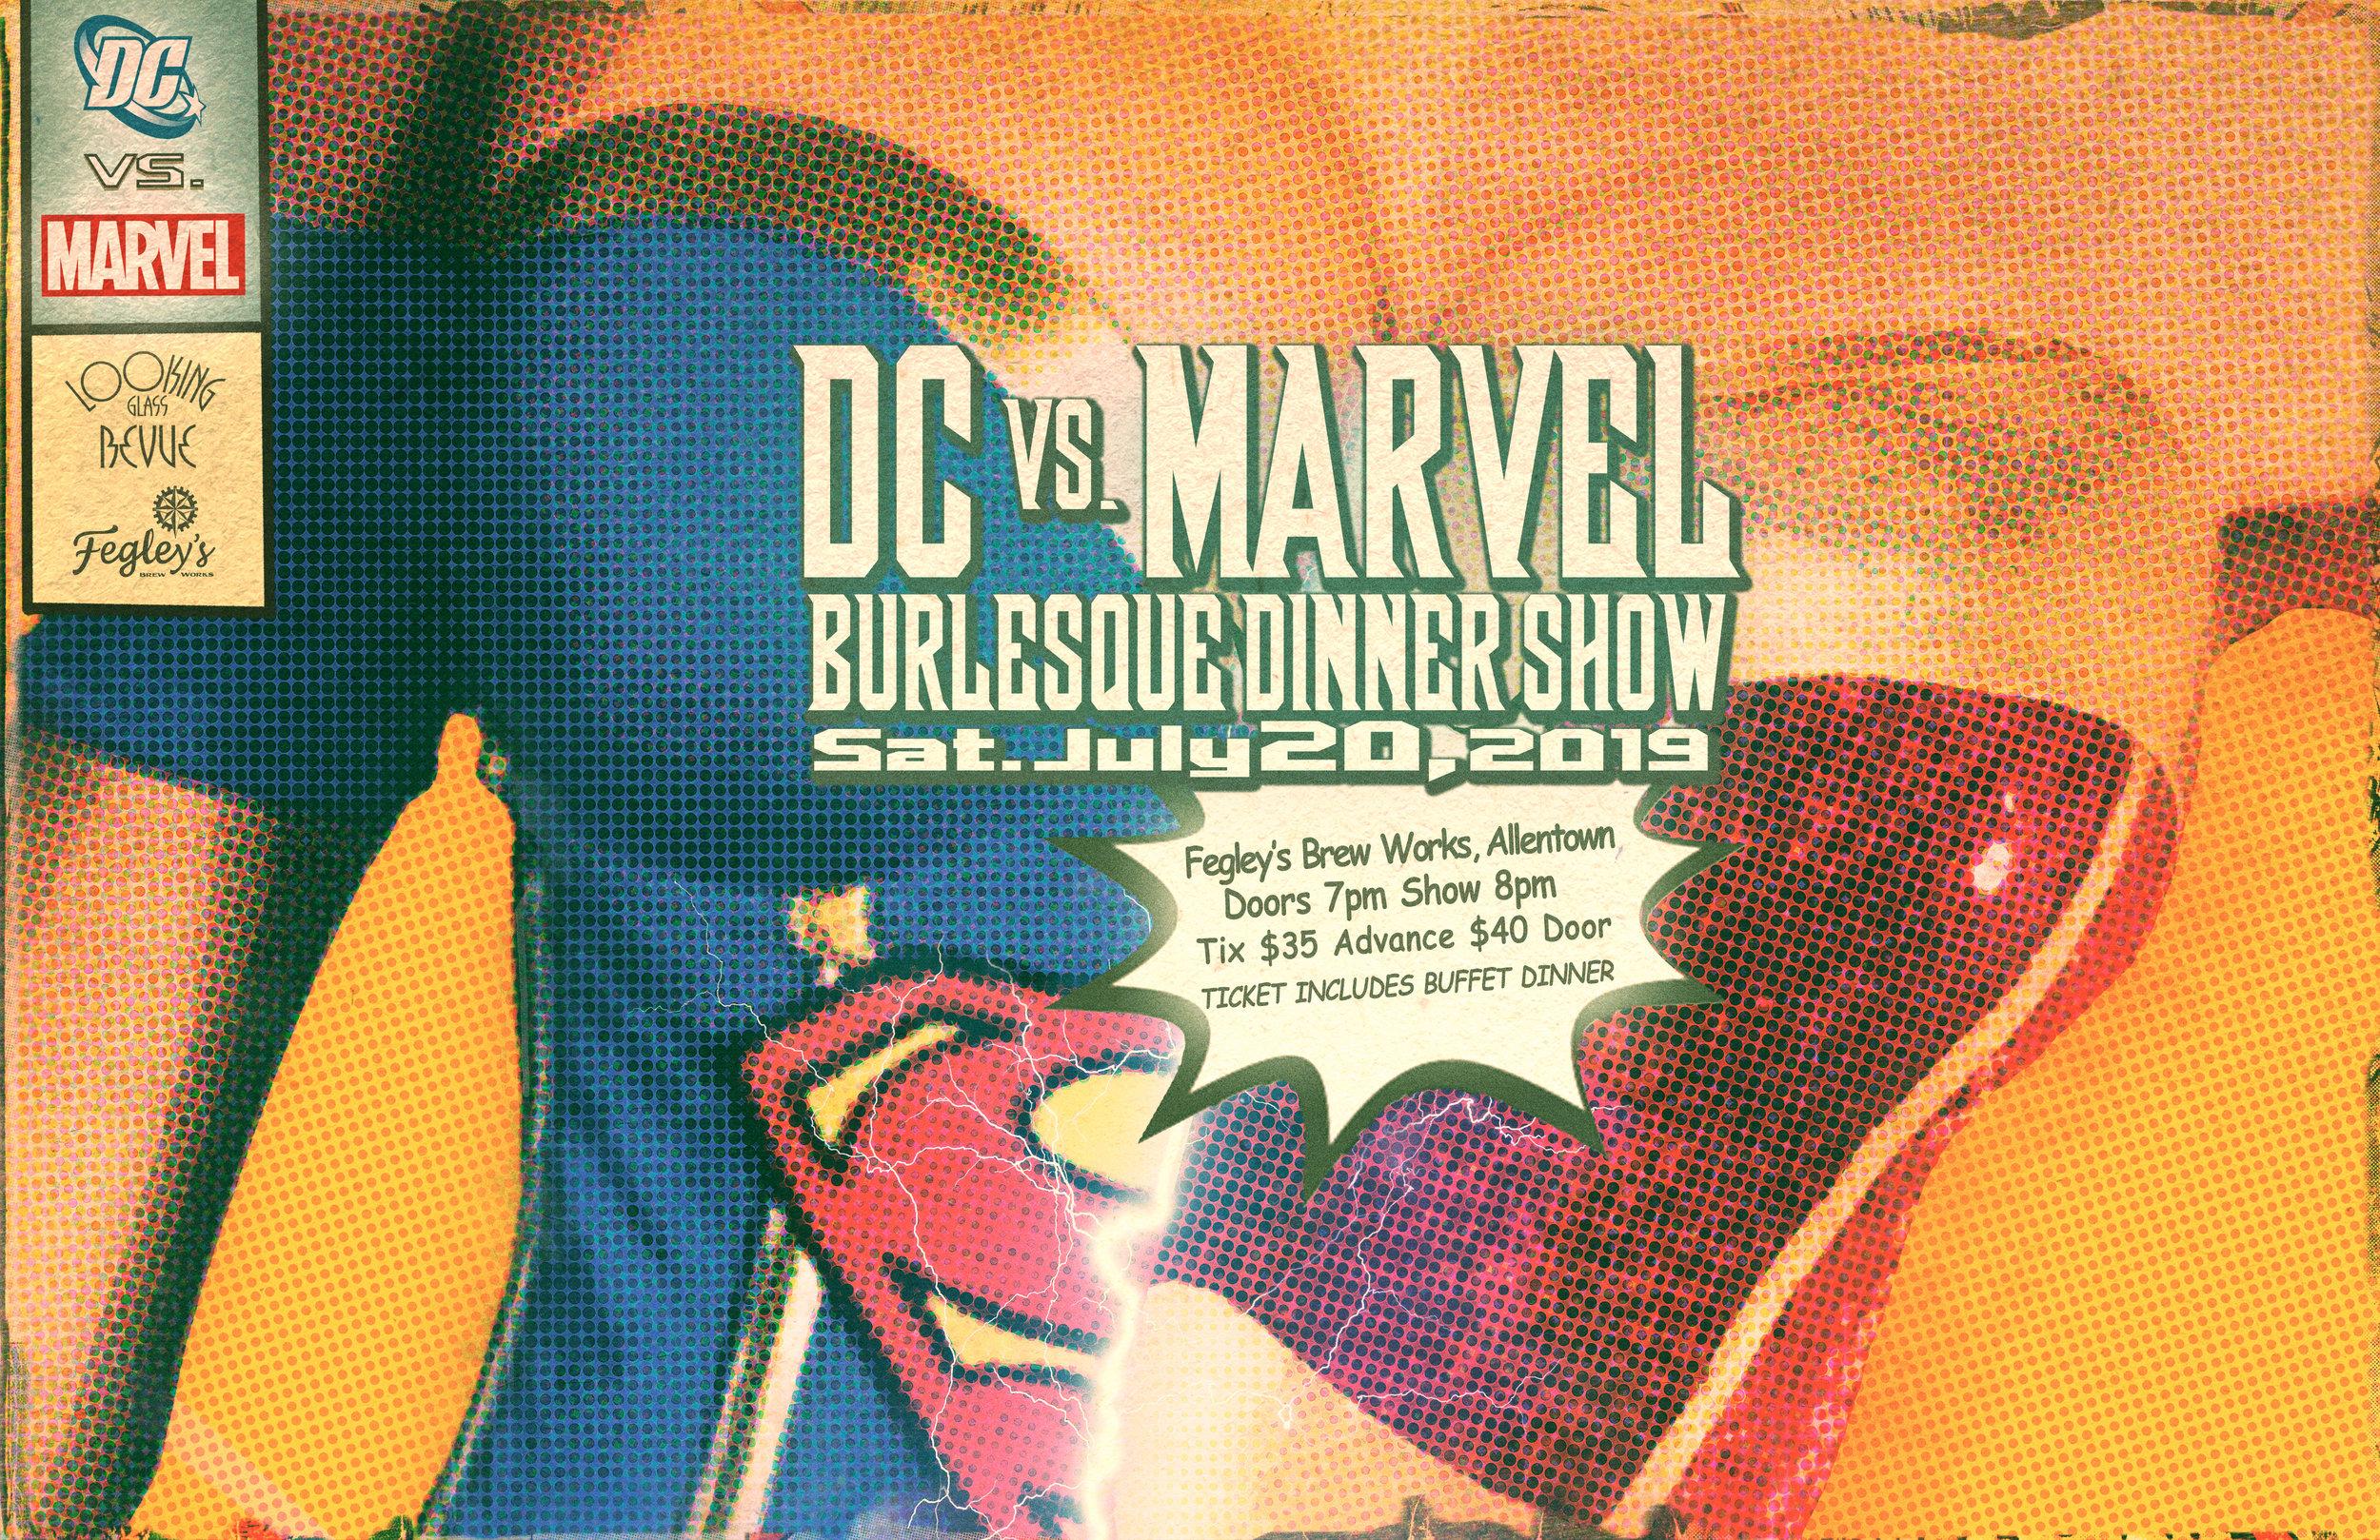 072019- DC vs Marvel.jpg